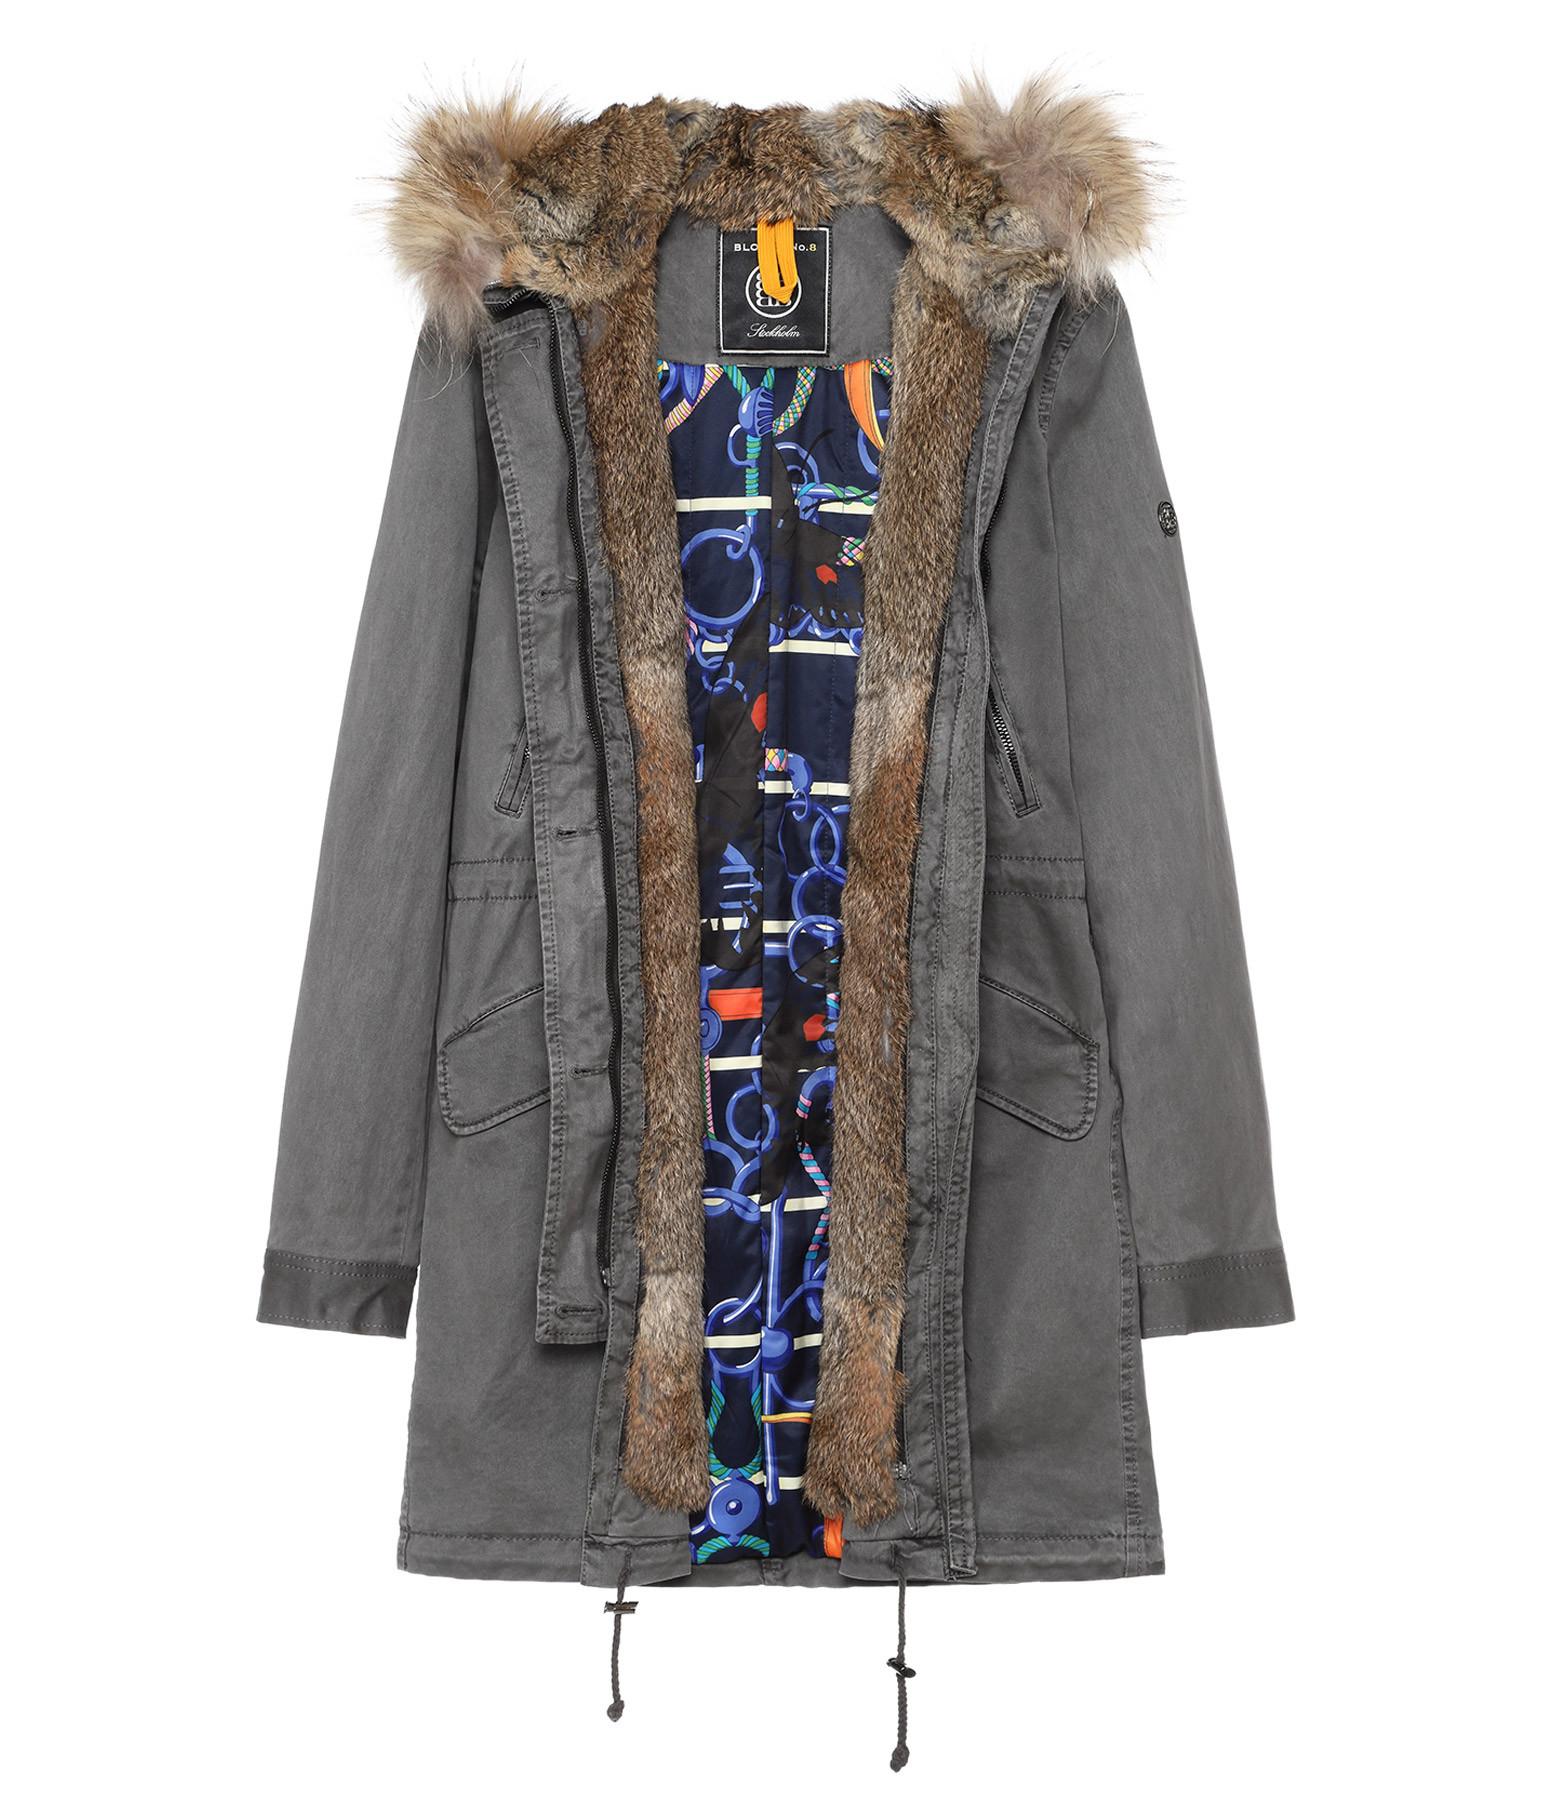 BLONDE N°8 - Parka Aspen 515 Frost Gris